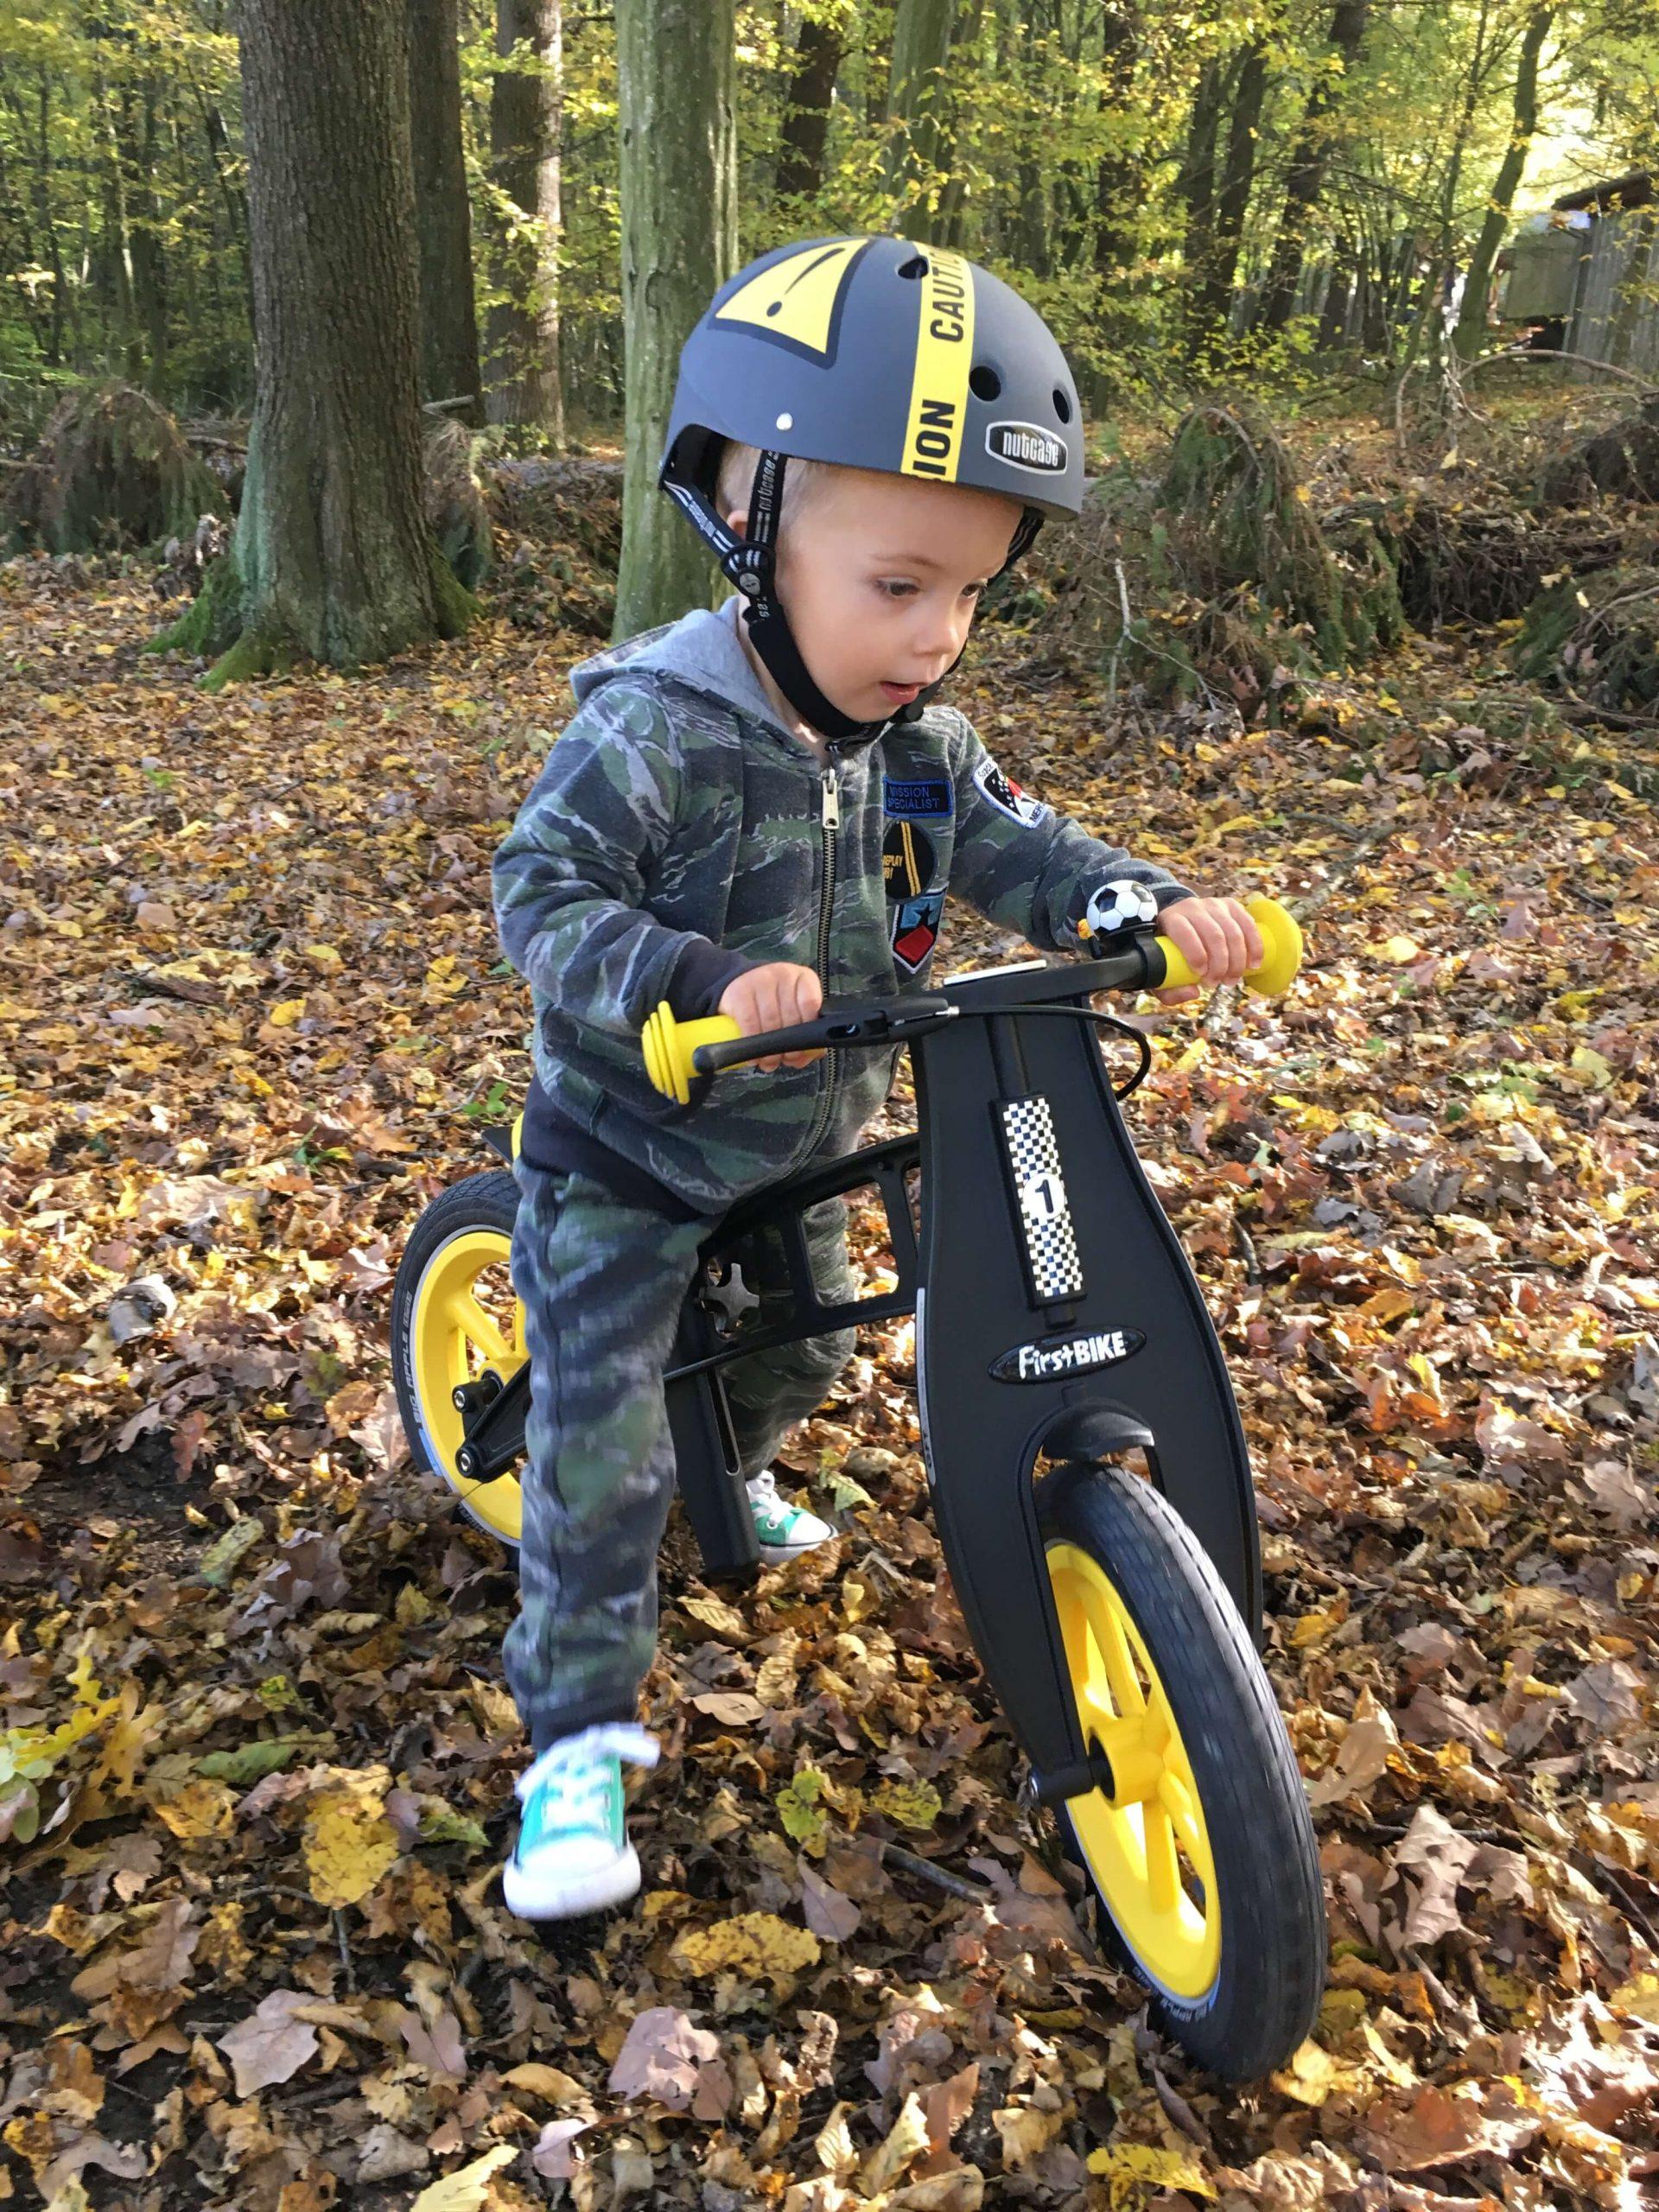 FirstBIKE Balance Bike Limited Edition Yellow2